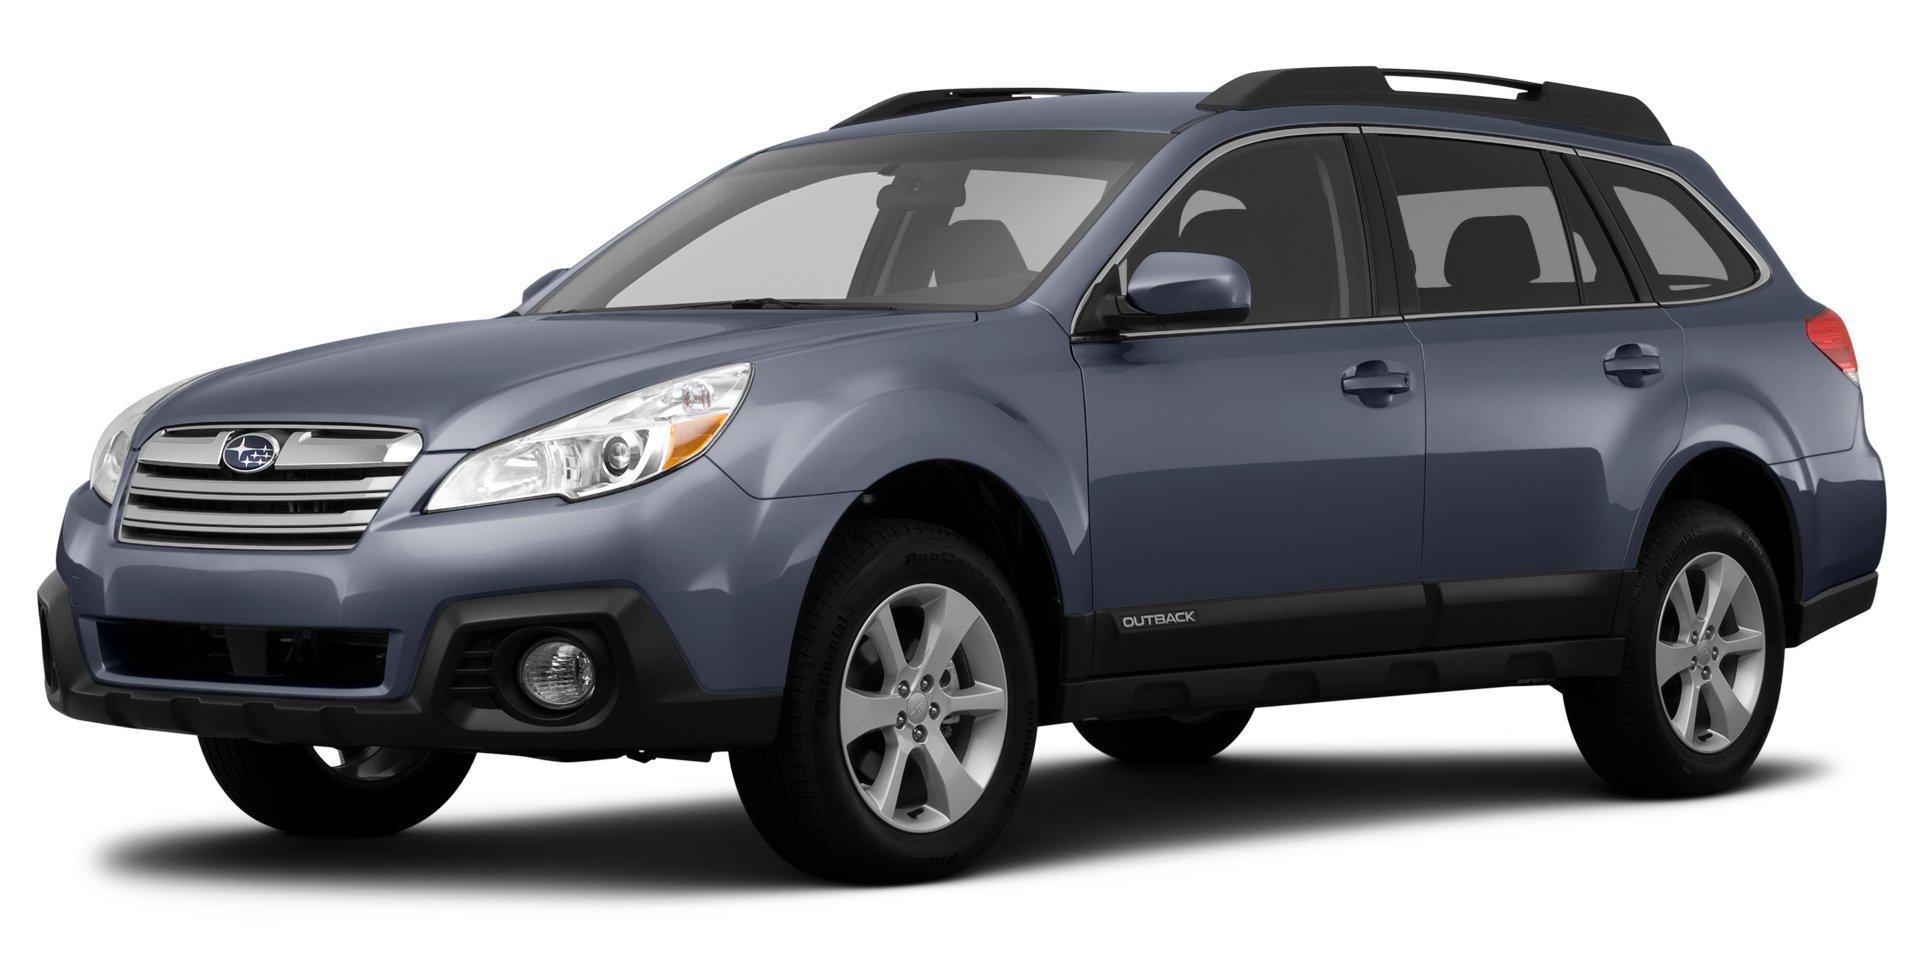 ... 2014 Subaru Outback 2.5i Premium, 4-Door Wagon 4-Cylinder Manual Transmission ...